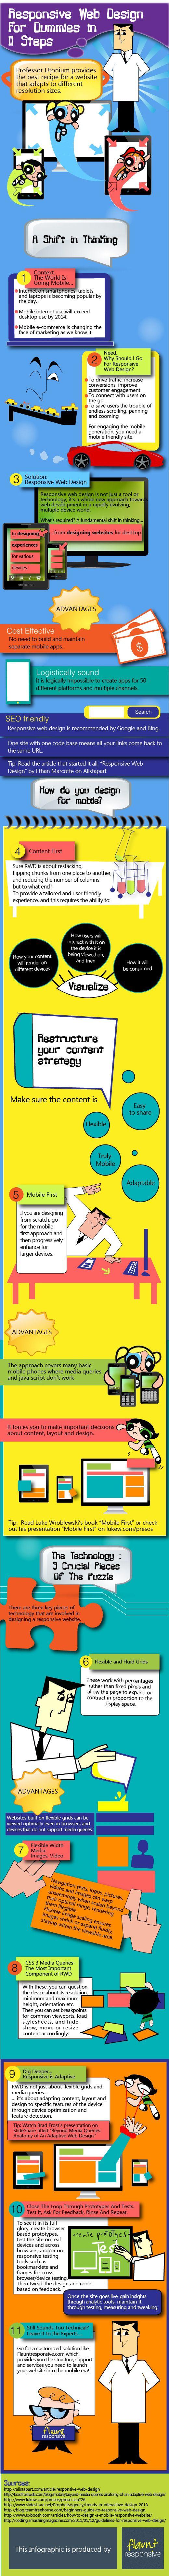 Diseño responsive para web para Dummies #infografia #infographic #design